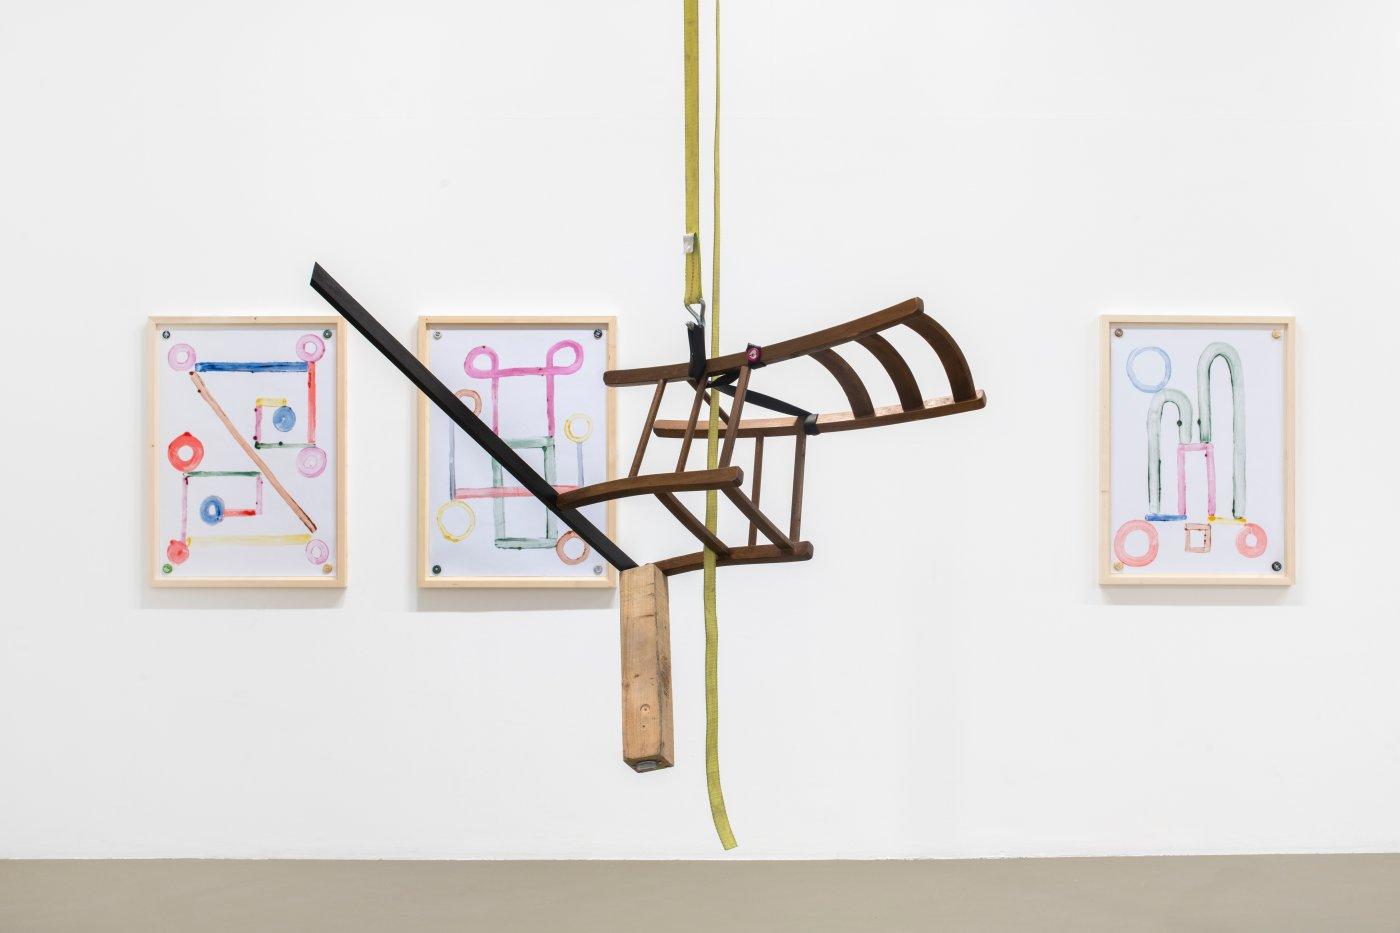 Galerie Chantal Crousel Abraham Cruzvillegas 5